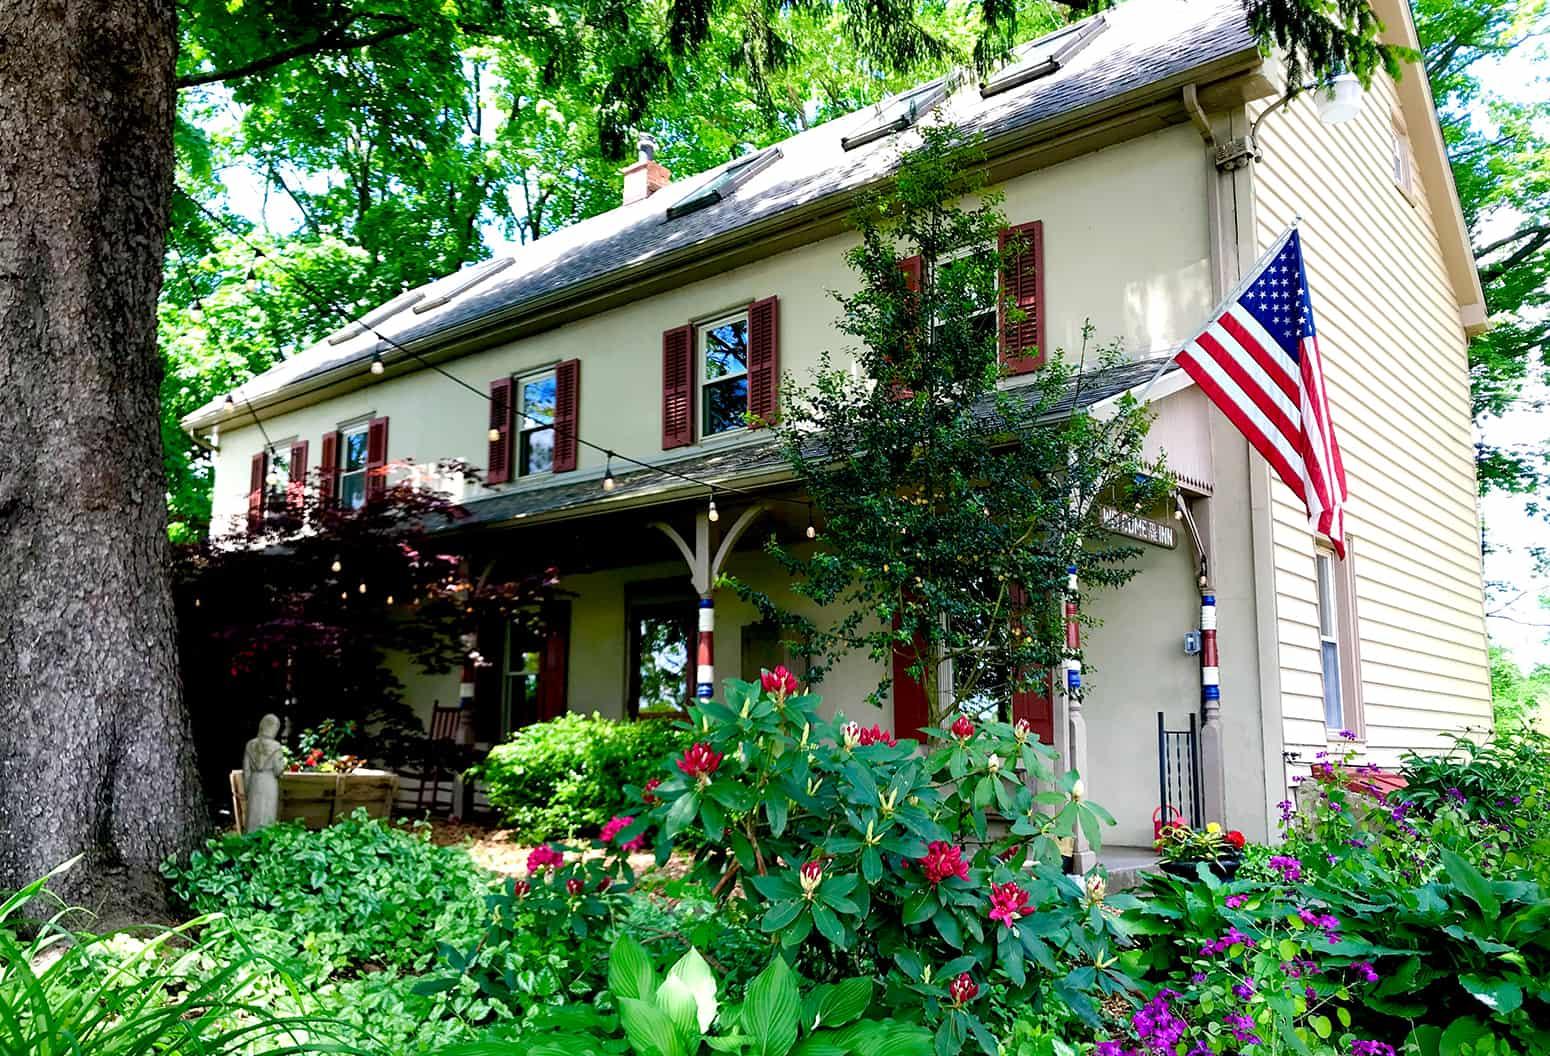 Inn exterior with American flag